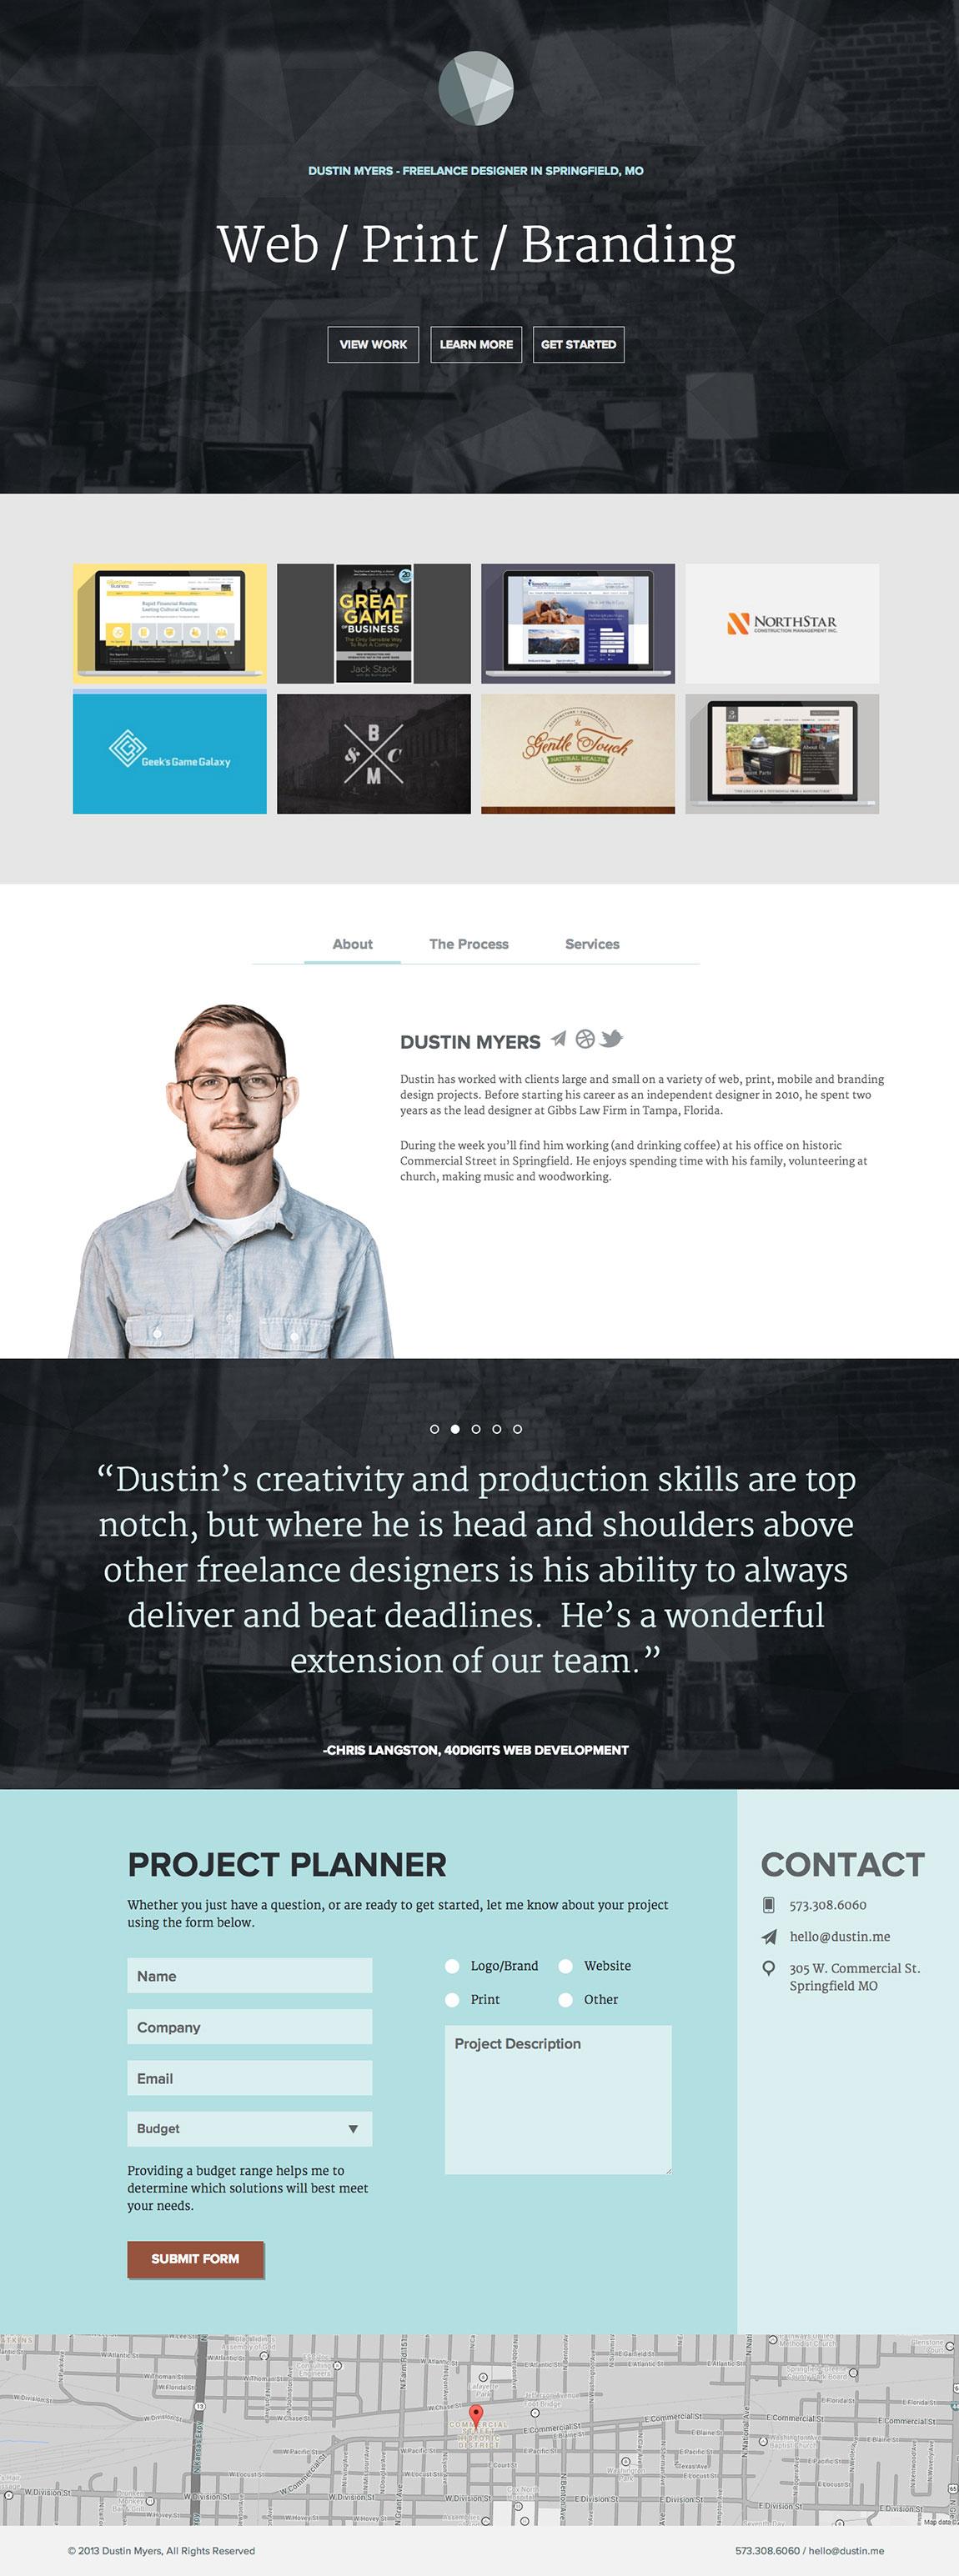 Dustin Myers Website Screenshot